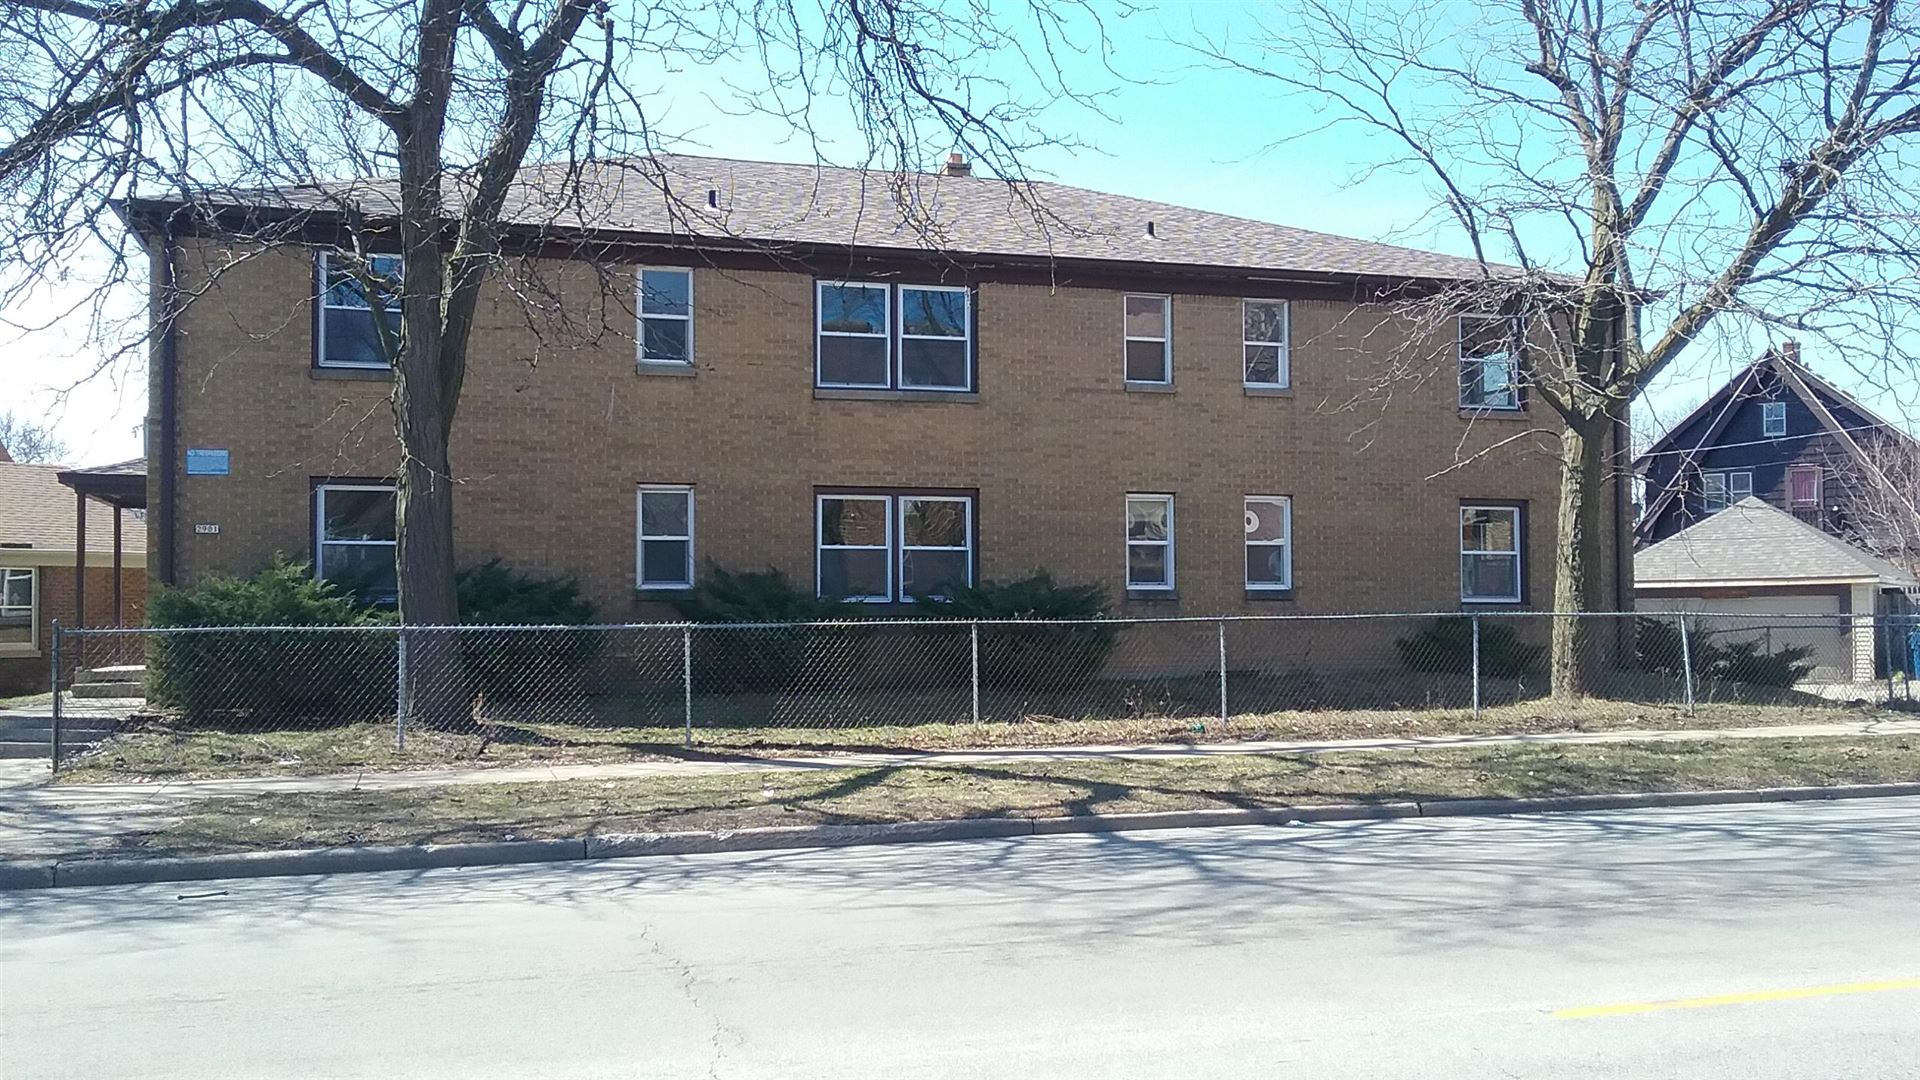 2901 W Atkinson Ave, Milwaukee, WI 53209 - #: 1685689